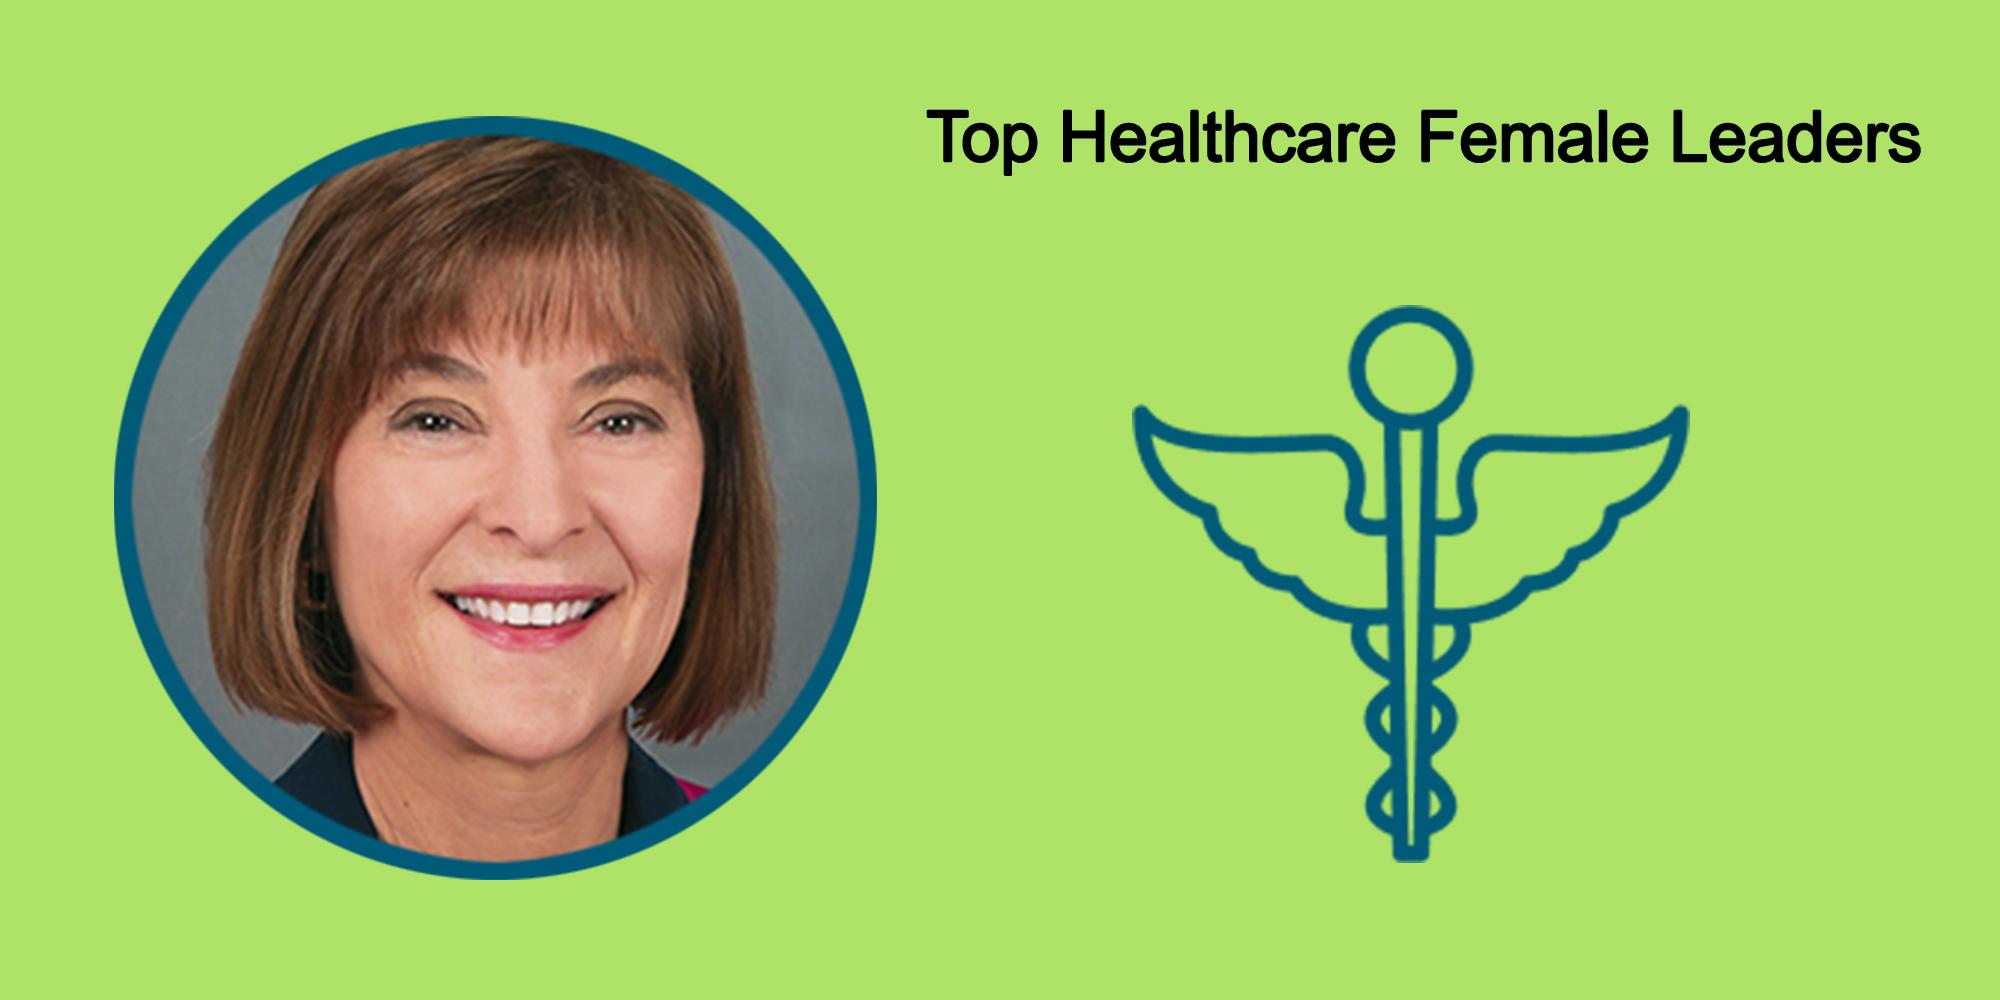 25 Top Fema25 Top Female Leaders Transform The Healthcare Industry-Body Image 28ale Leaders Transform The Healthcare Industry-Body Image 2